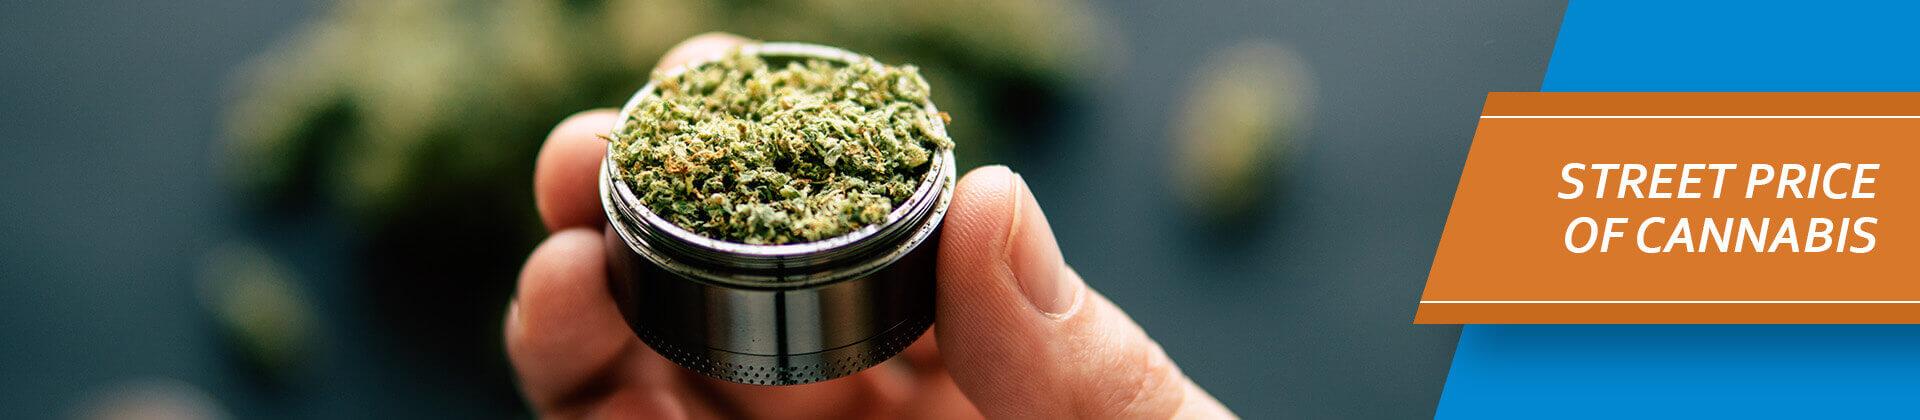 street price of cannabis